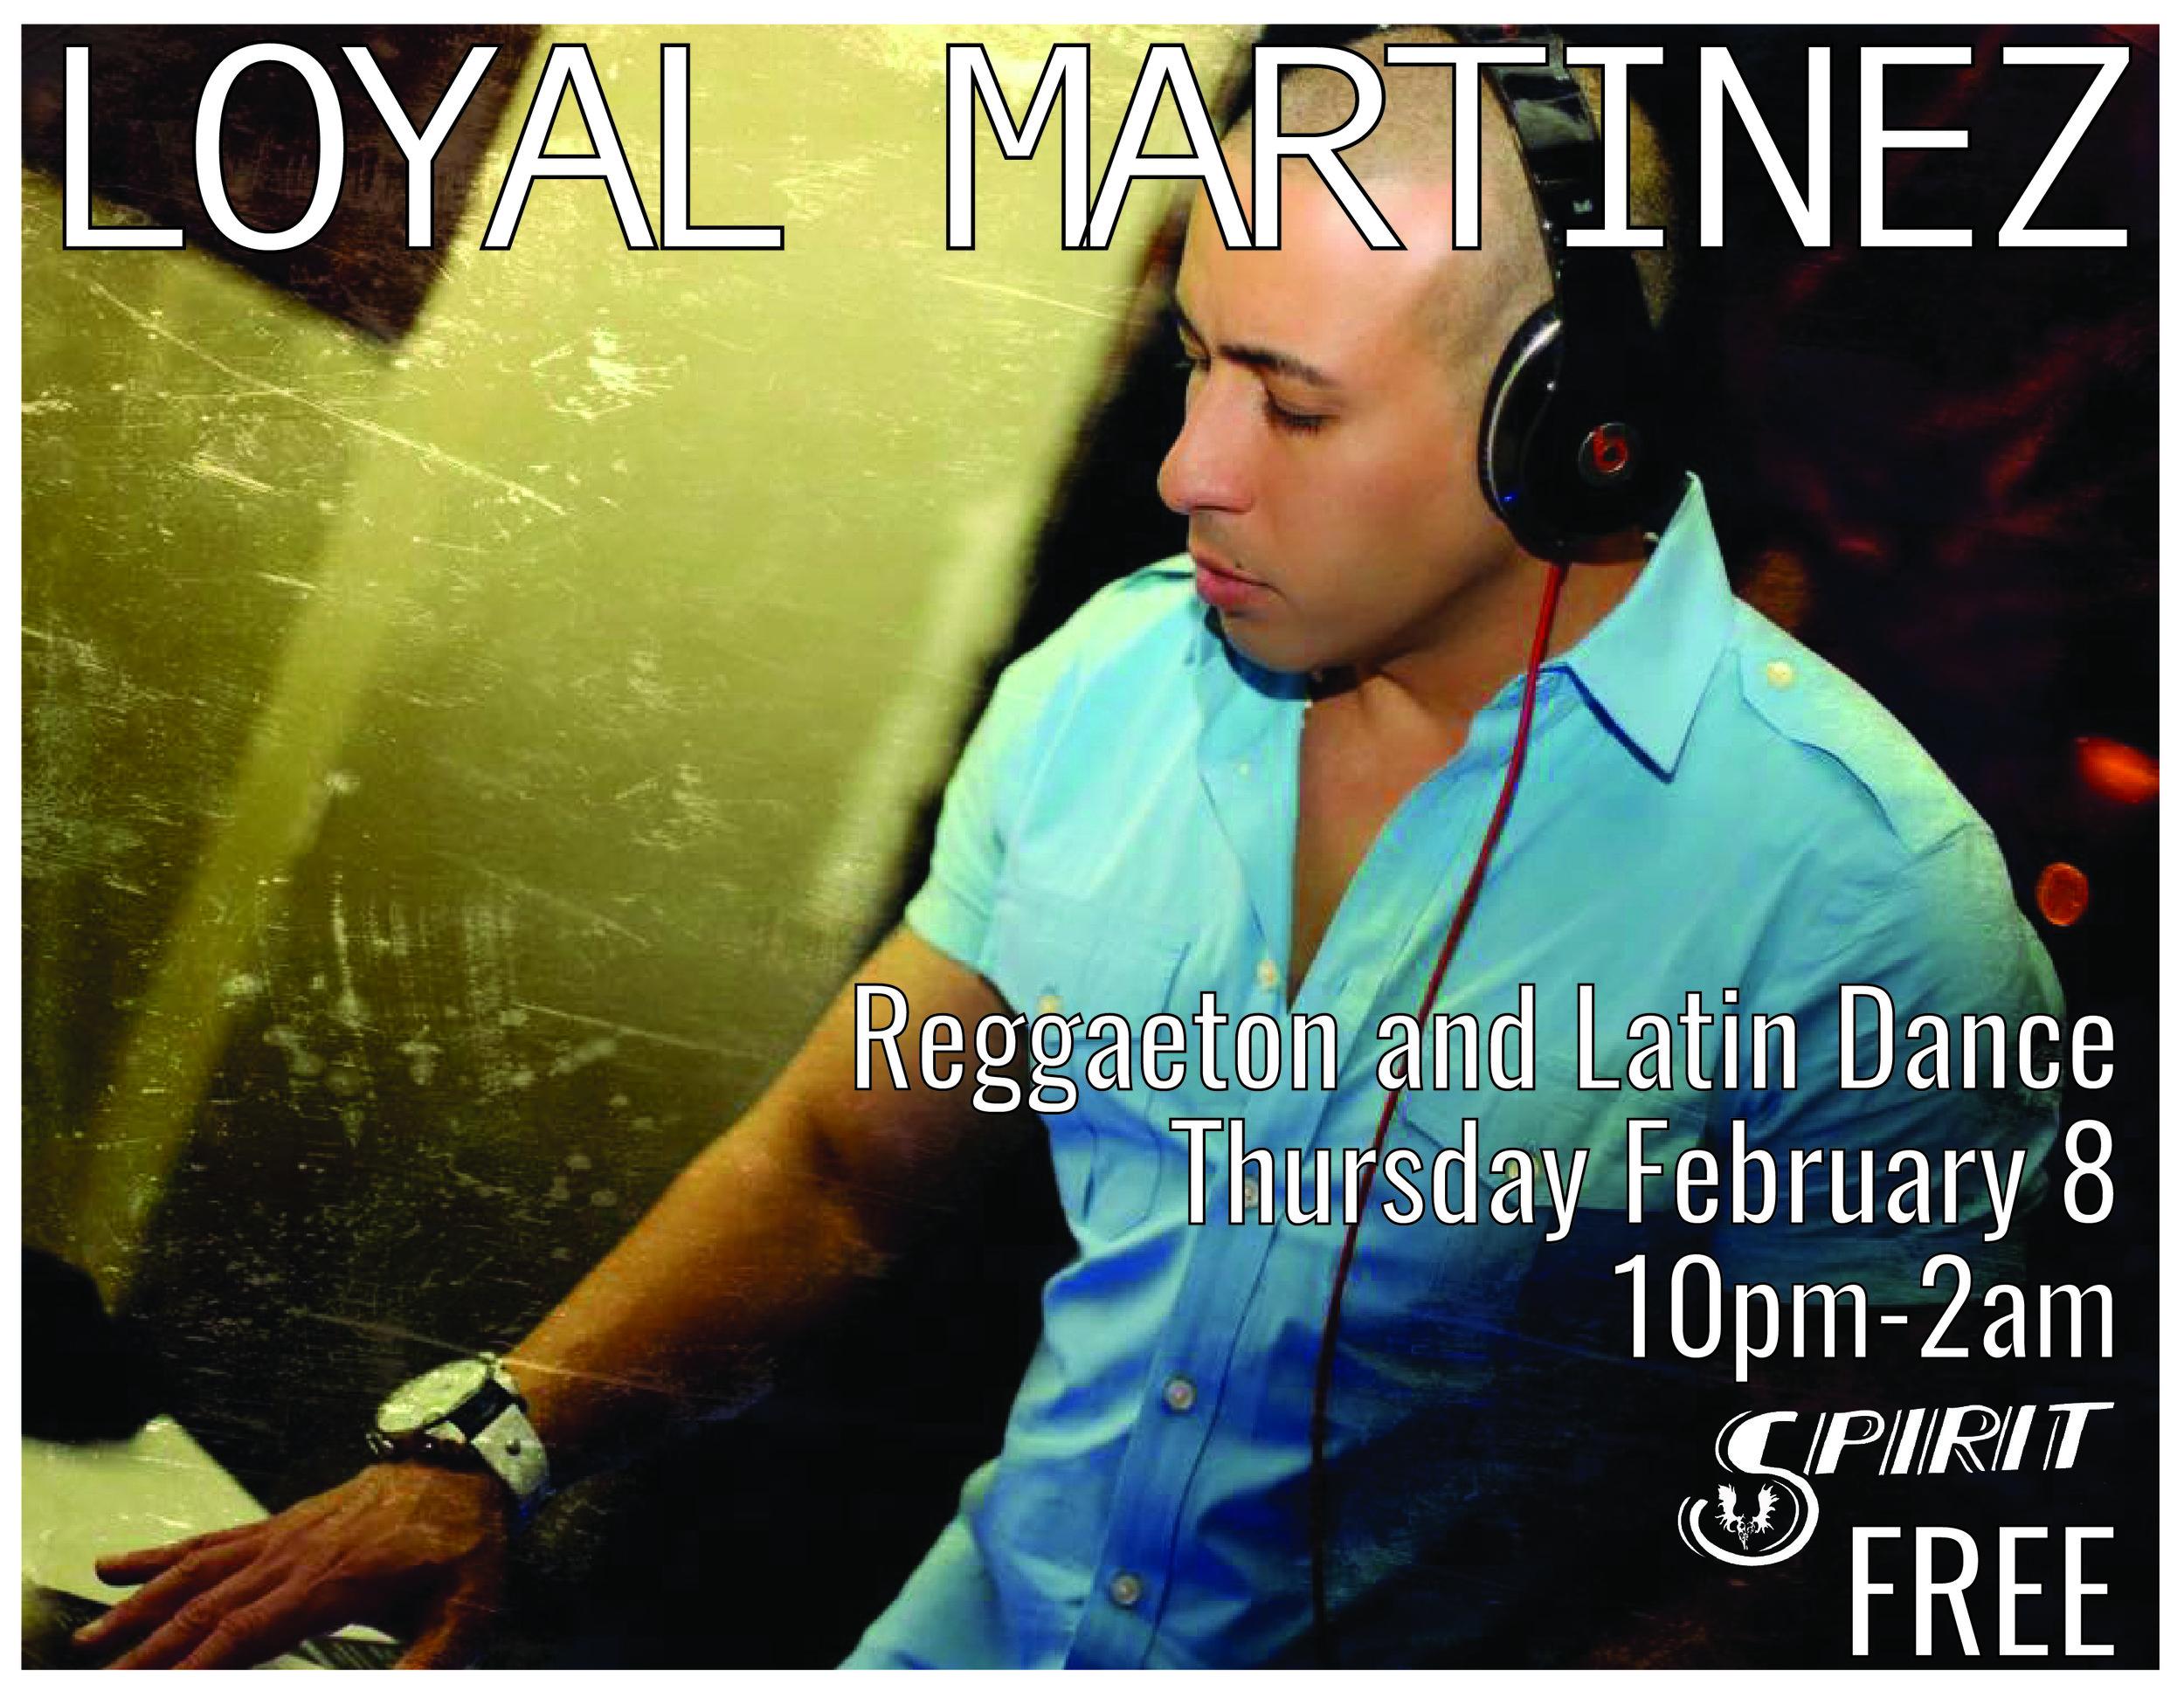 Loyal Martinez flyer.jpg